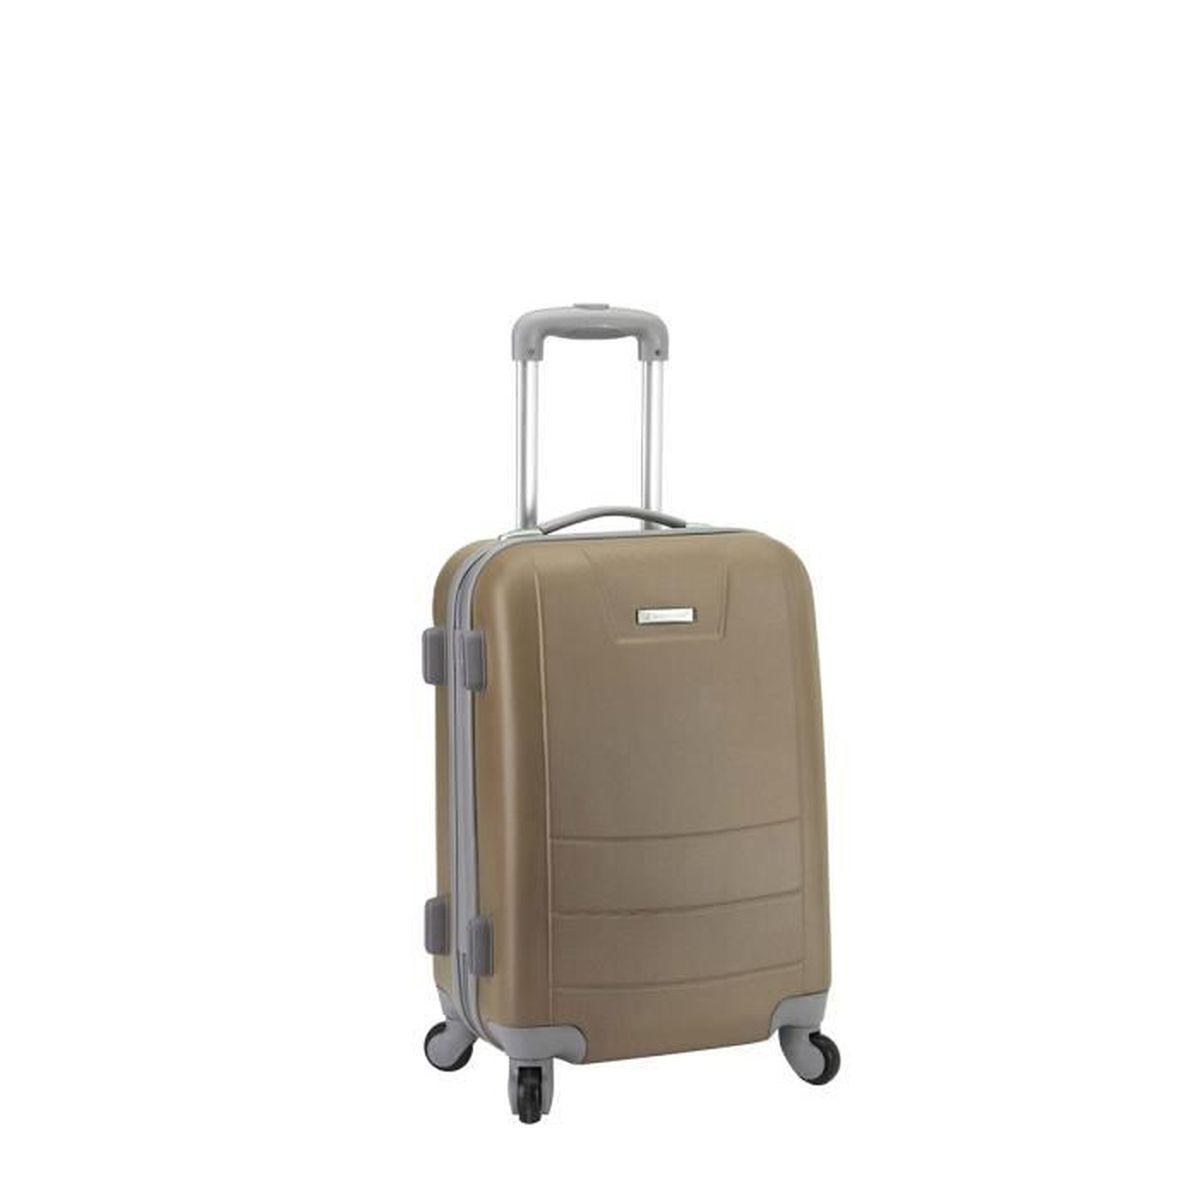 valise cabine rigide tokyo 54 cm coffee achat vente. Black Bedroom Furniture Sets. Home Design Ideas